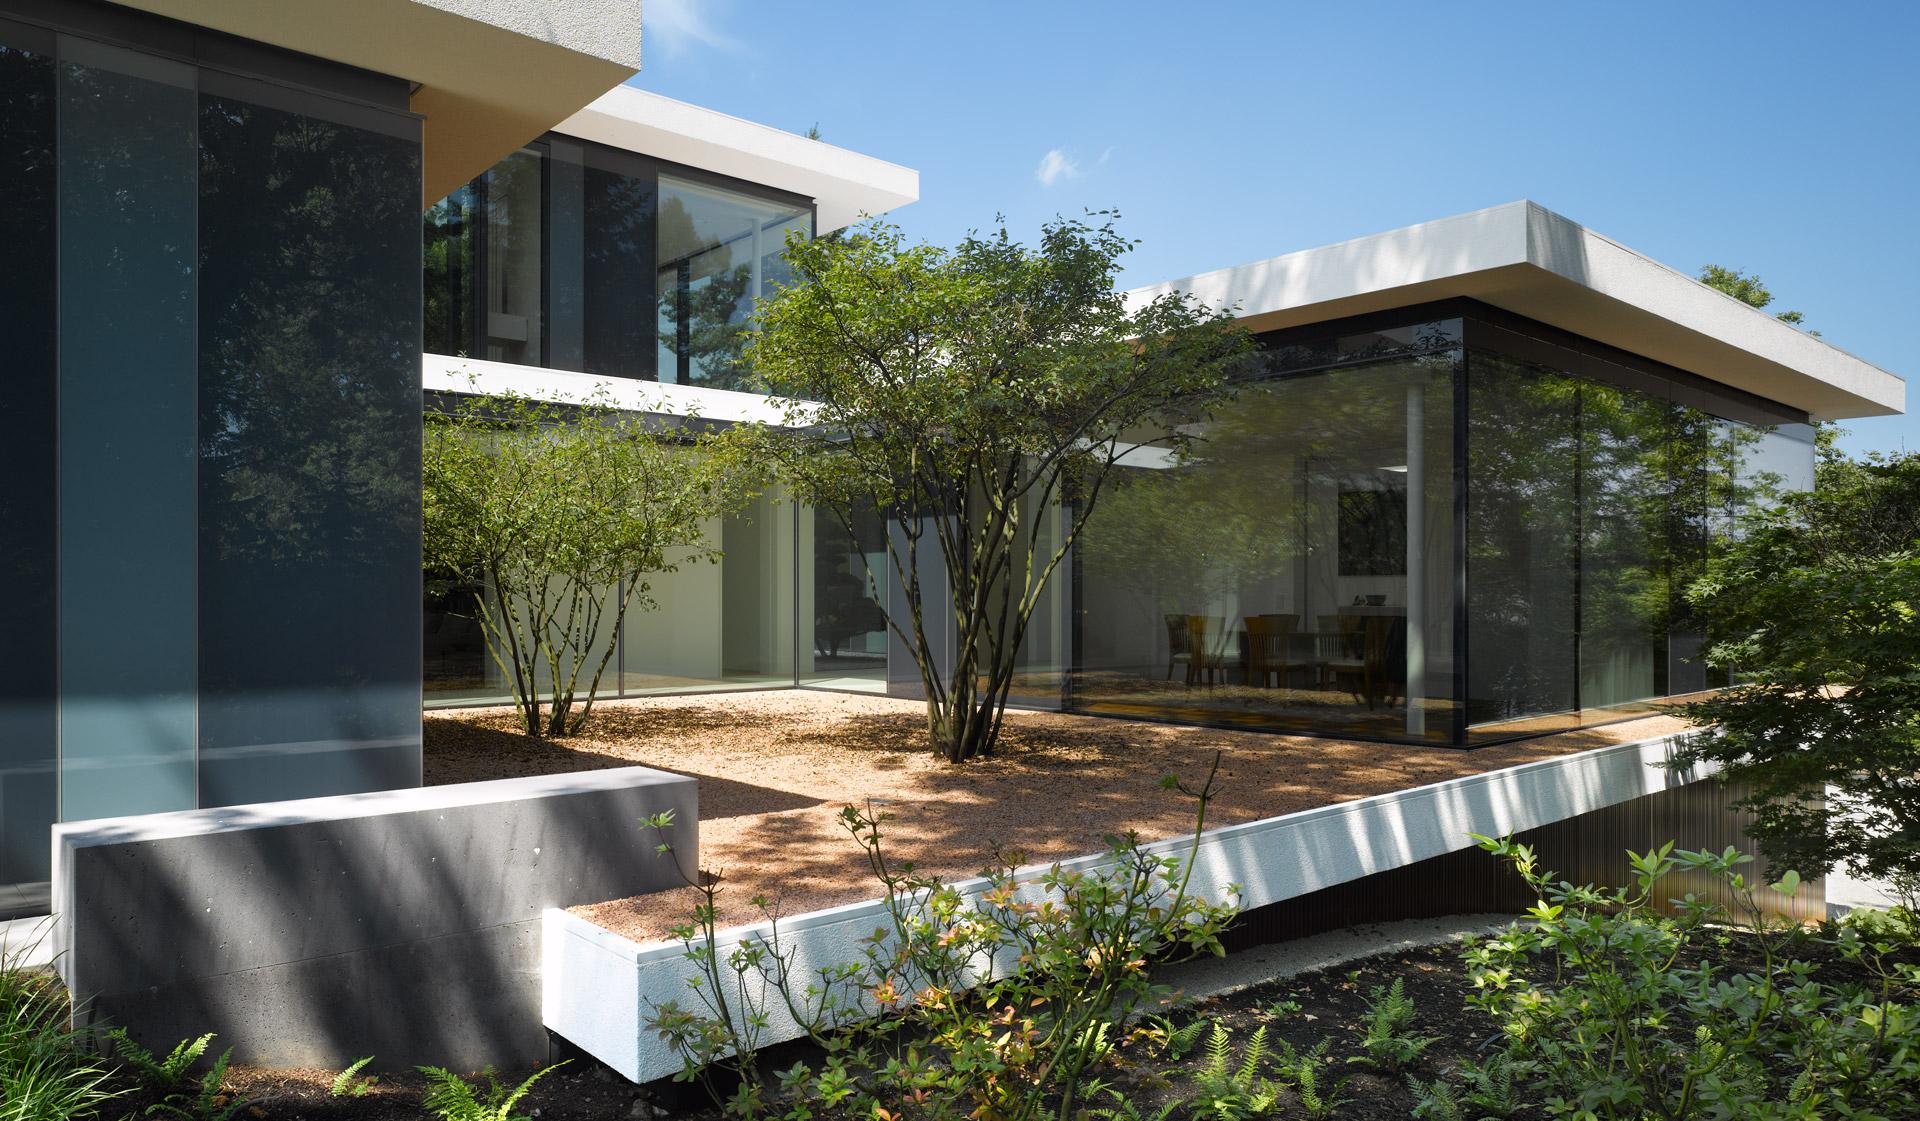 PavillonVilla in Bayern Weber Hummel Architekten 4